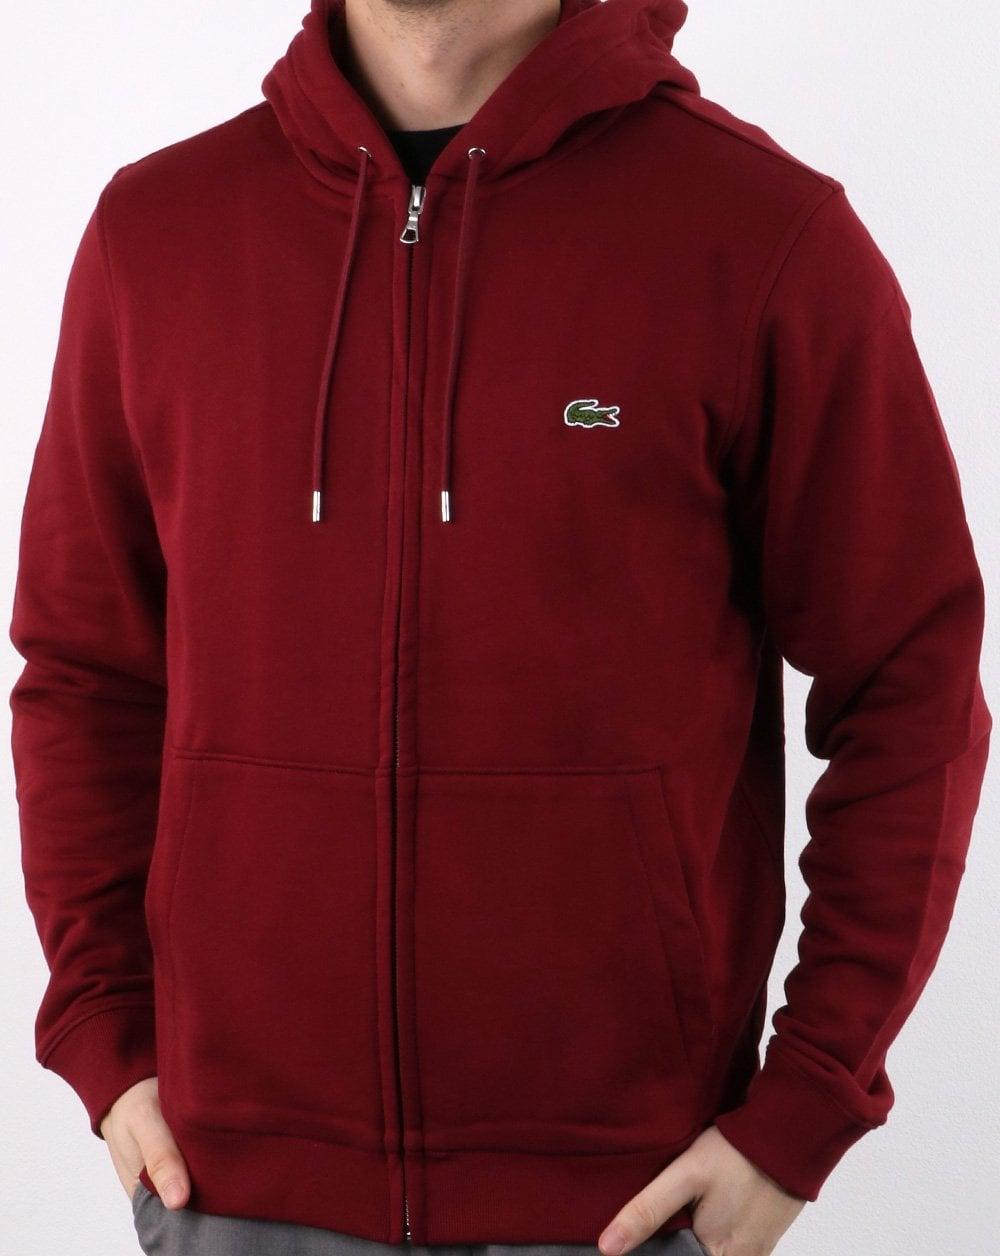 4248dad6 Lacoste Hooded Full Zip Sweatshirt Deep Red